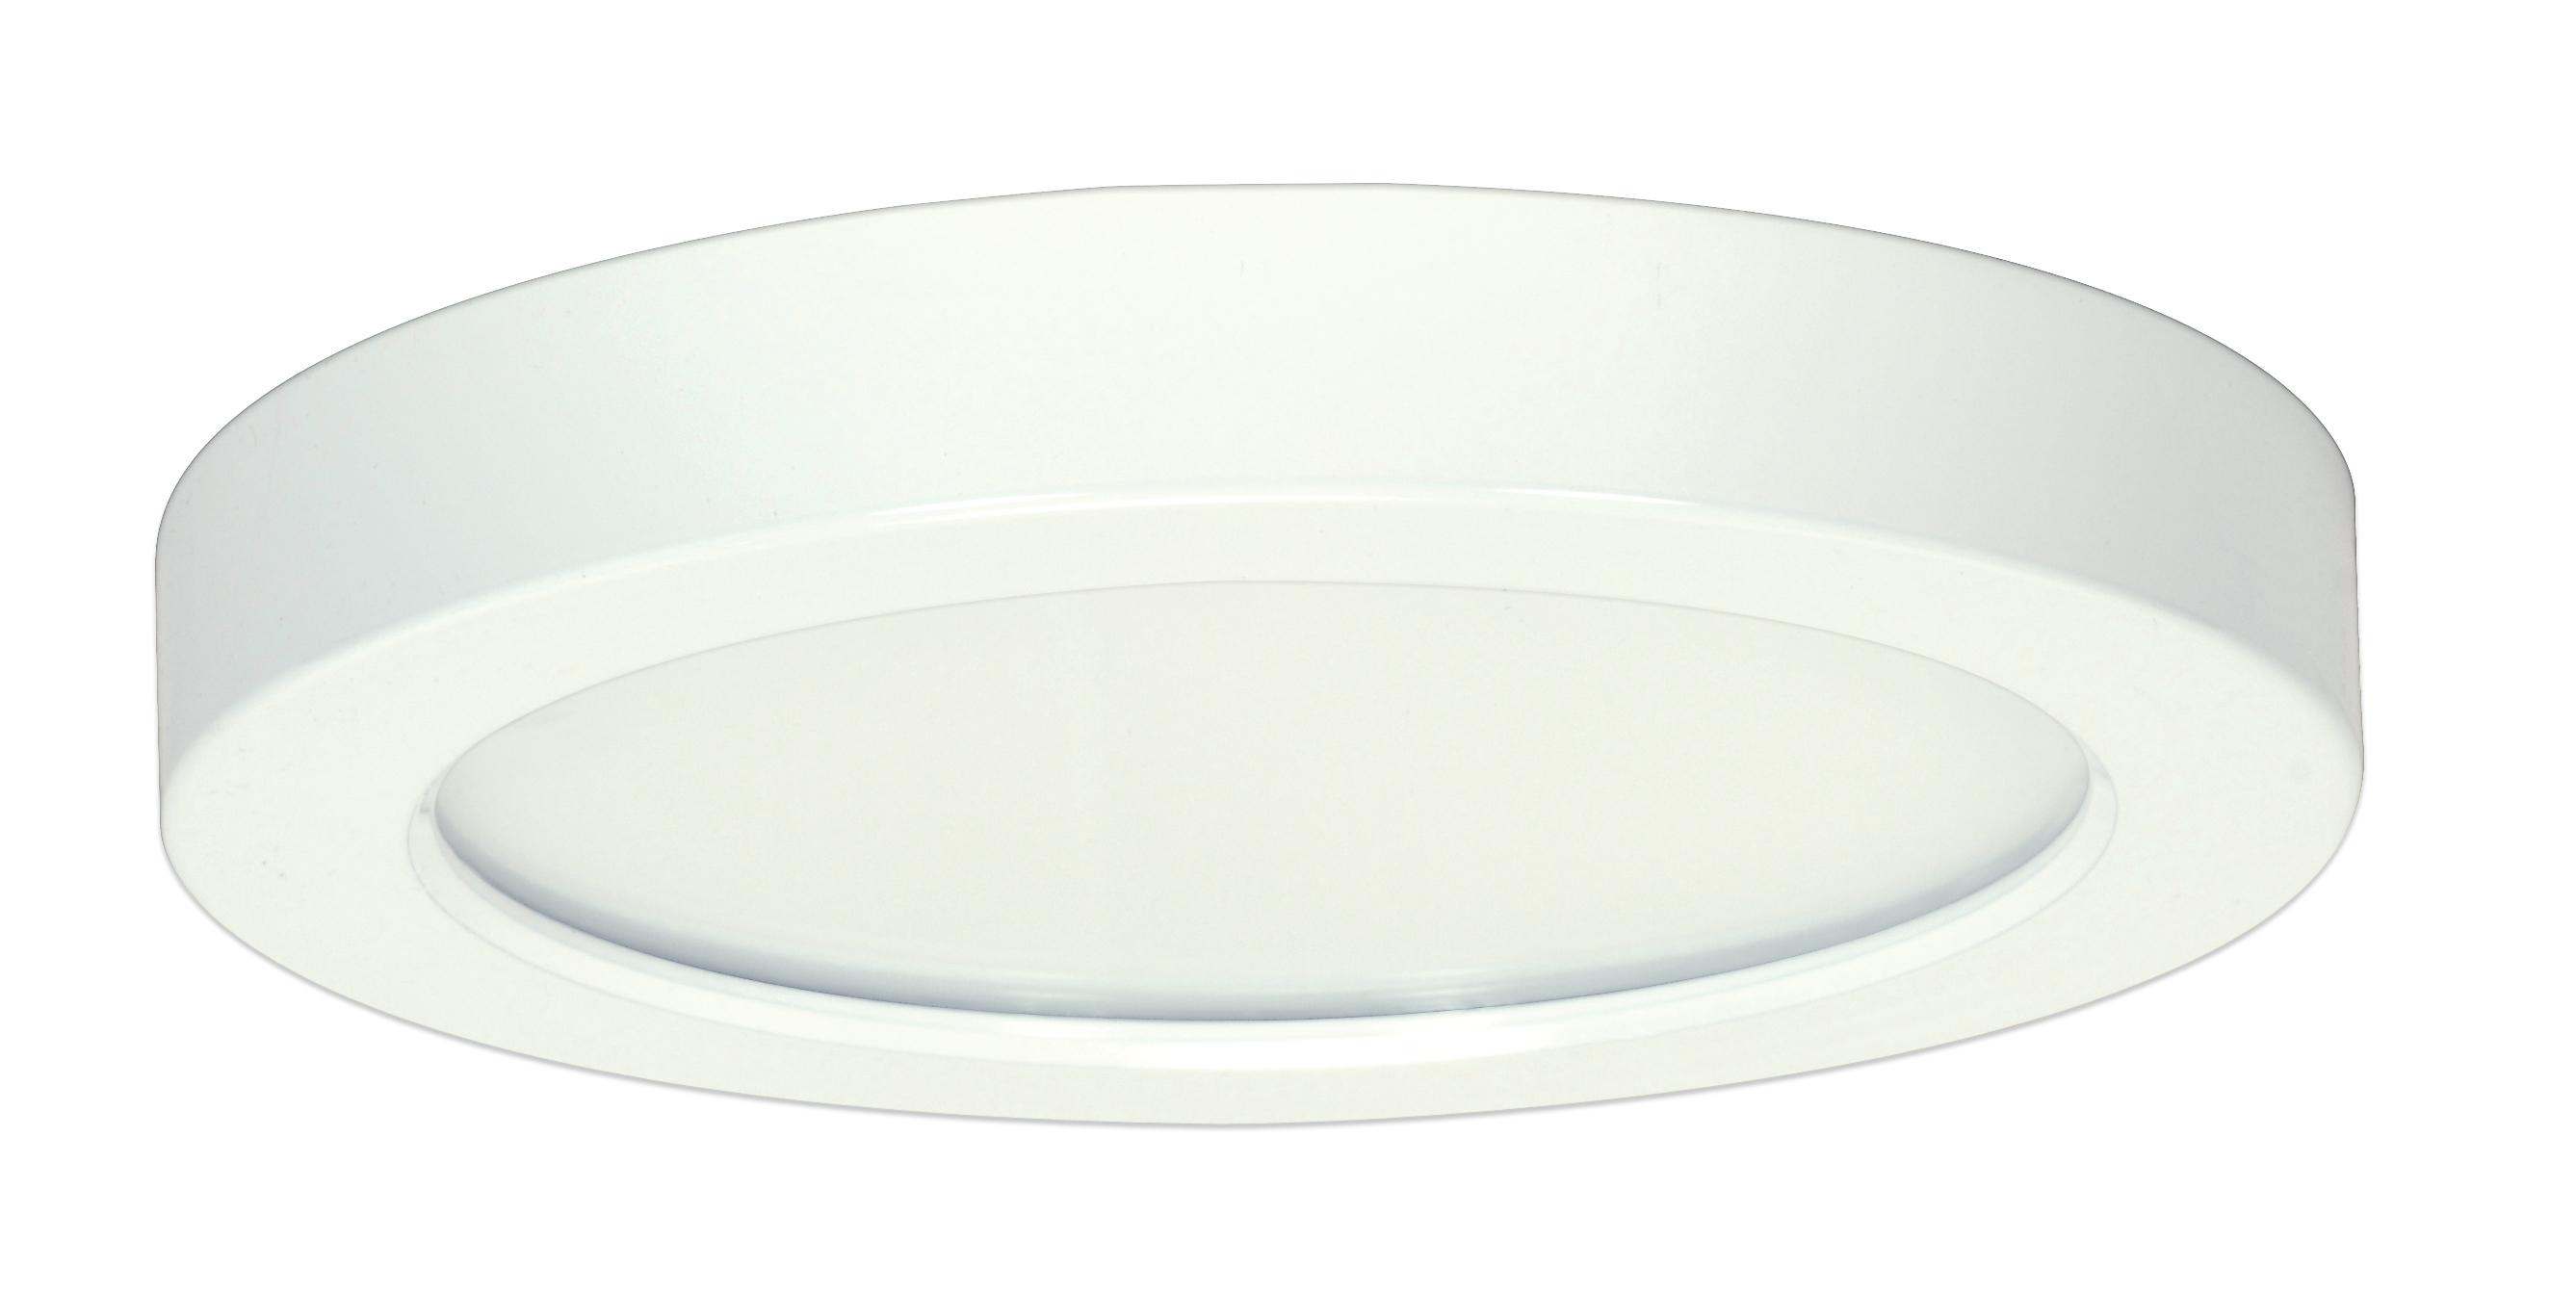 Satco,S9367,SATCO® Blink Dimmable Round Flush Mount Light, LED Lamp, 120 VAC, White Housing